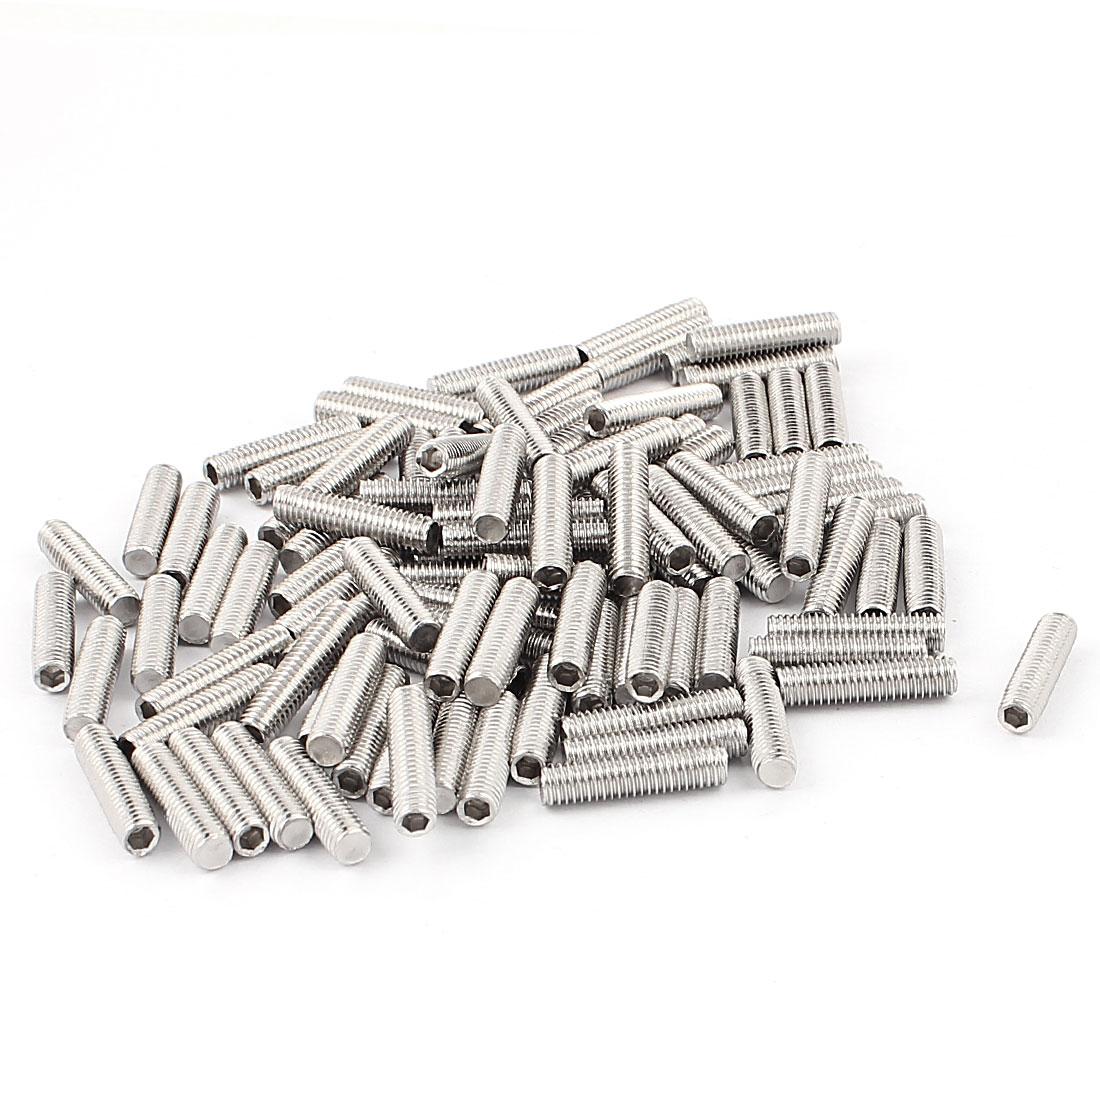 Stainless Steel M5 Thread Hex Socket Grub Set Screws Nut Fittings 100pcs